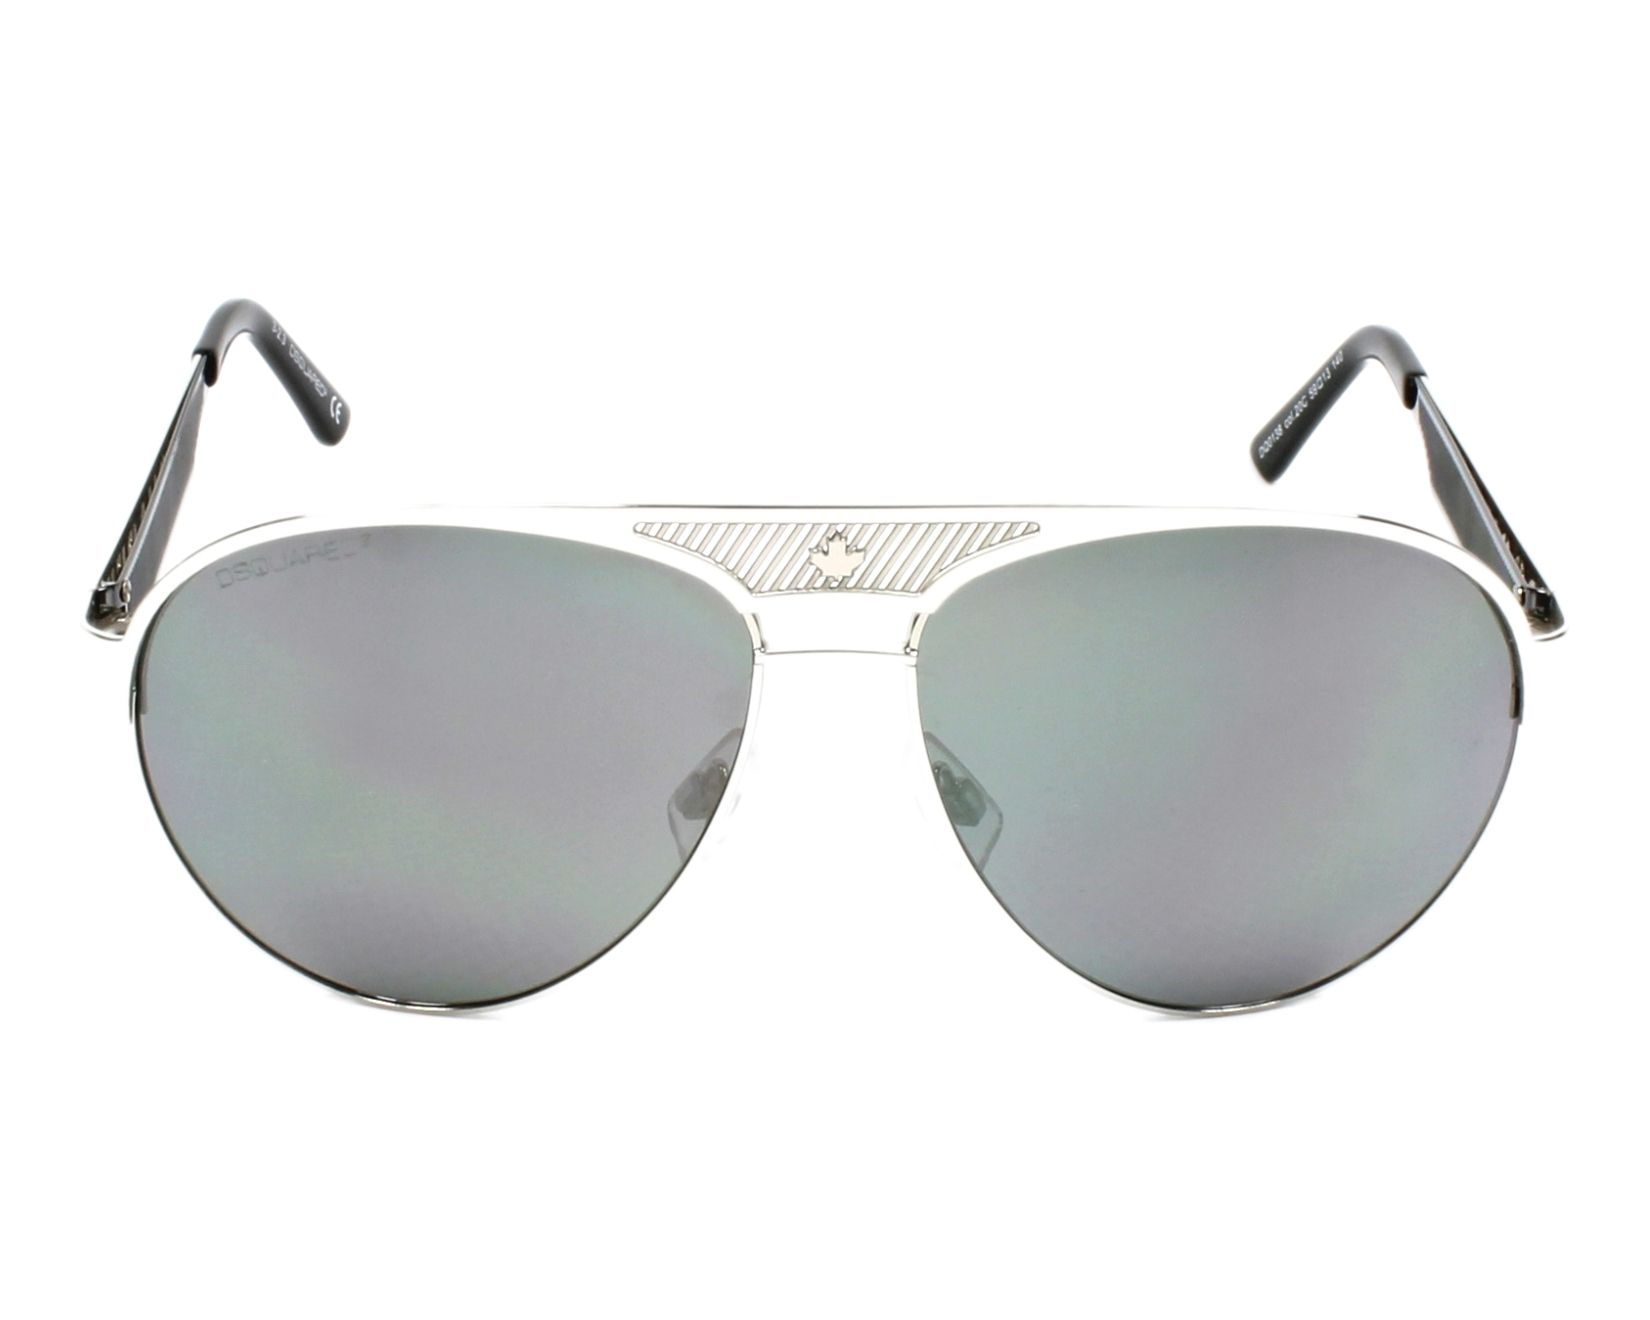 919fcbdf94 thumbnail Sunglasses DSQUARED DQ-0138 20C - Silver front view